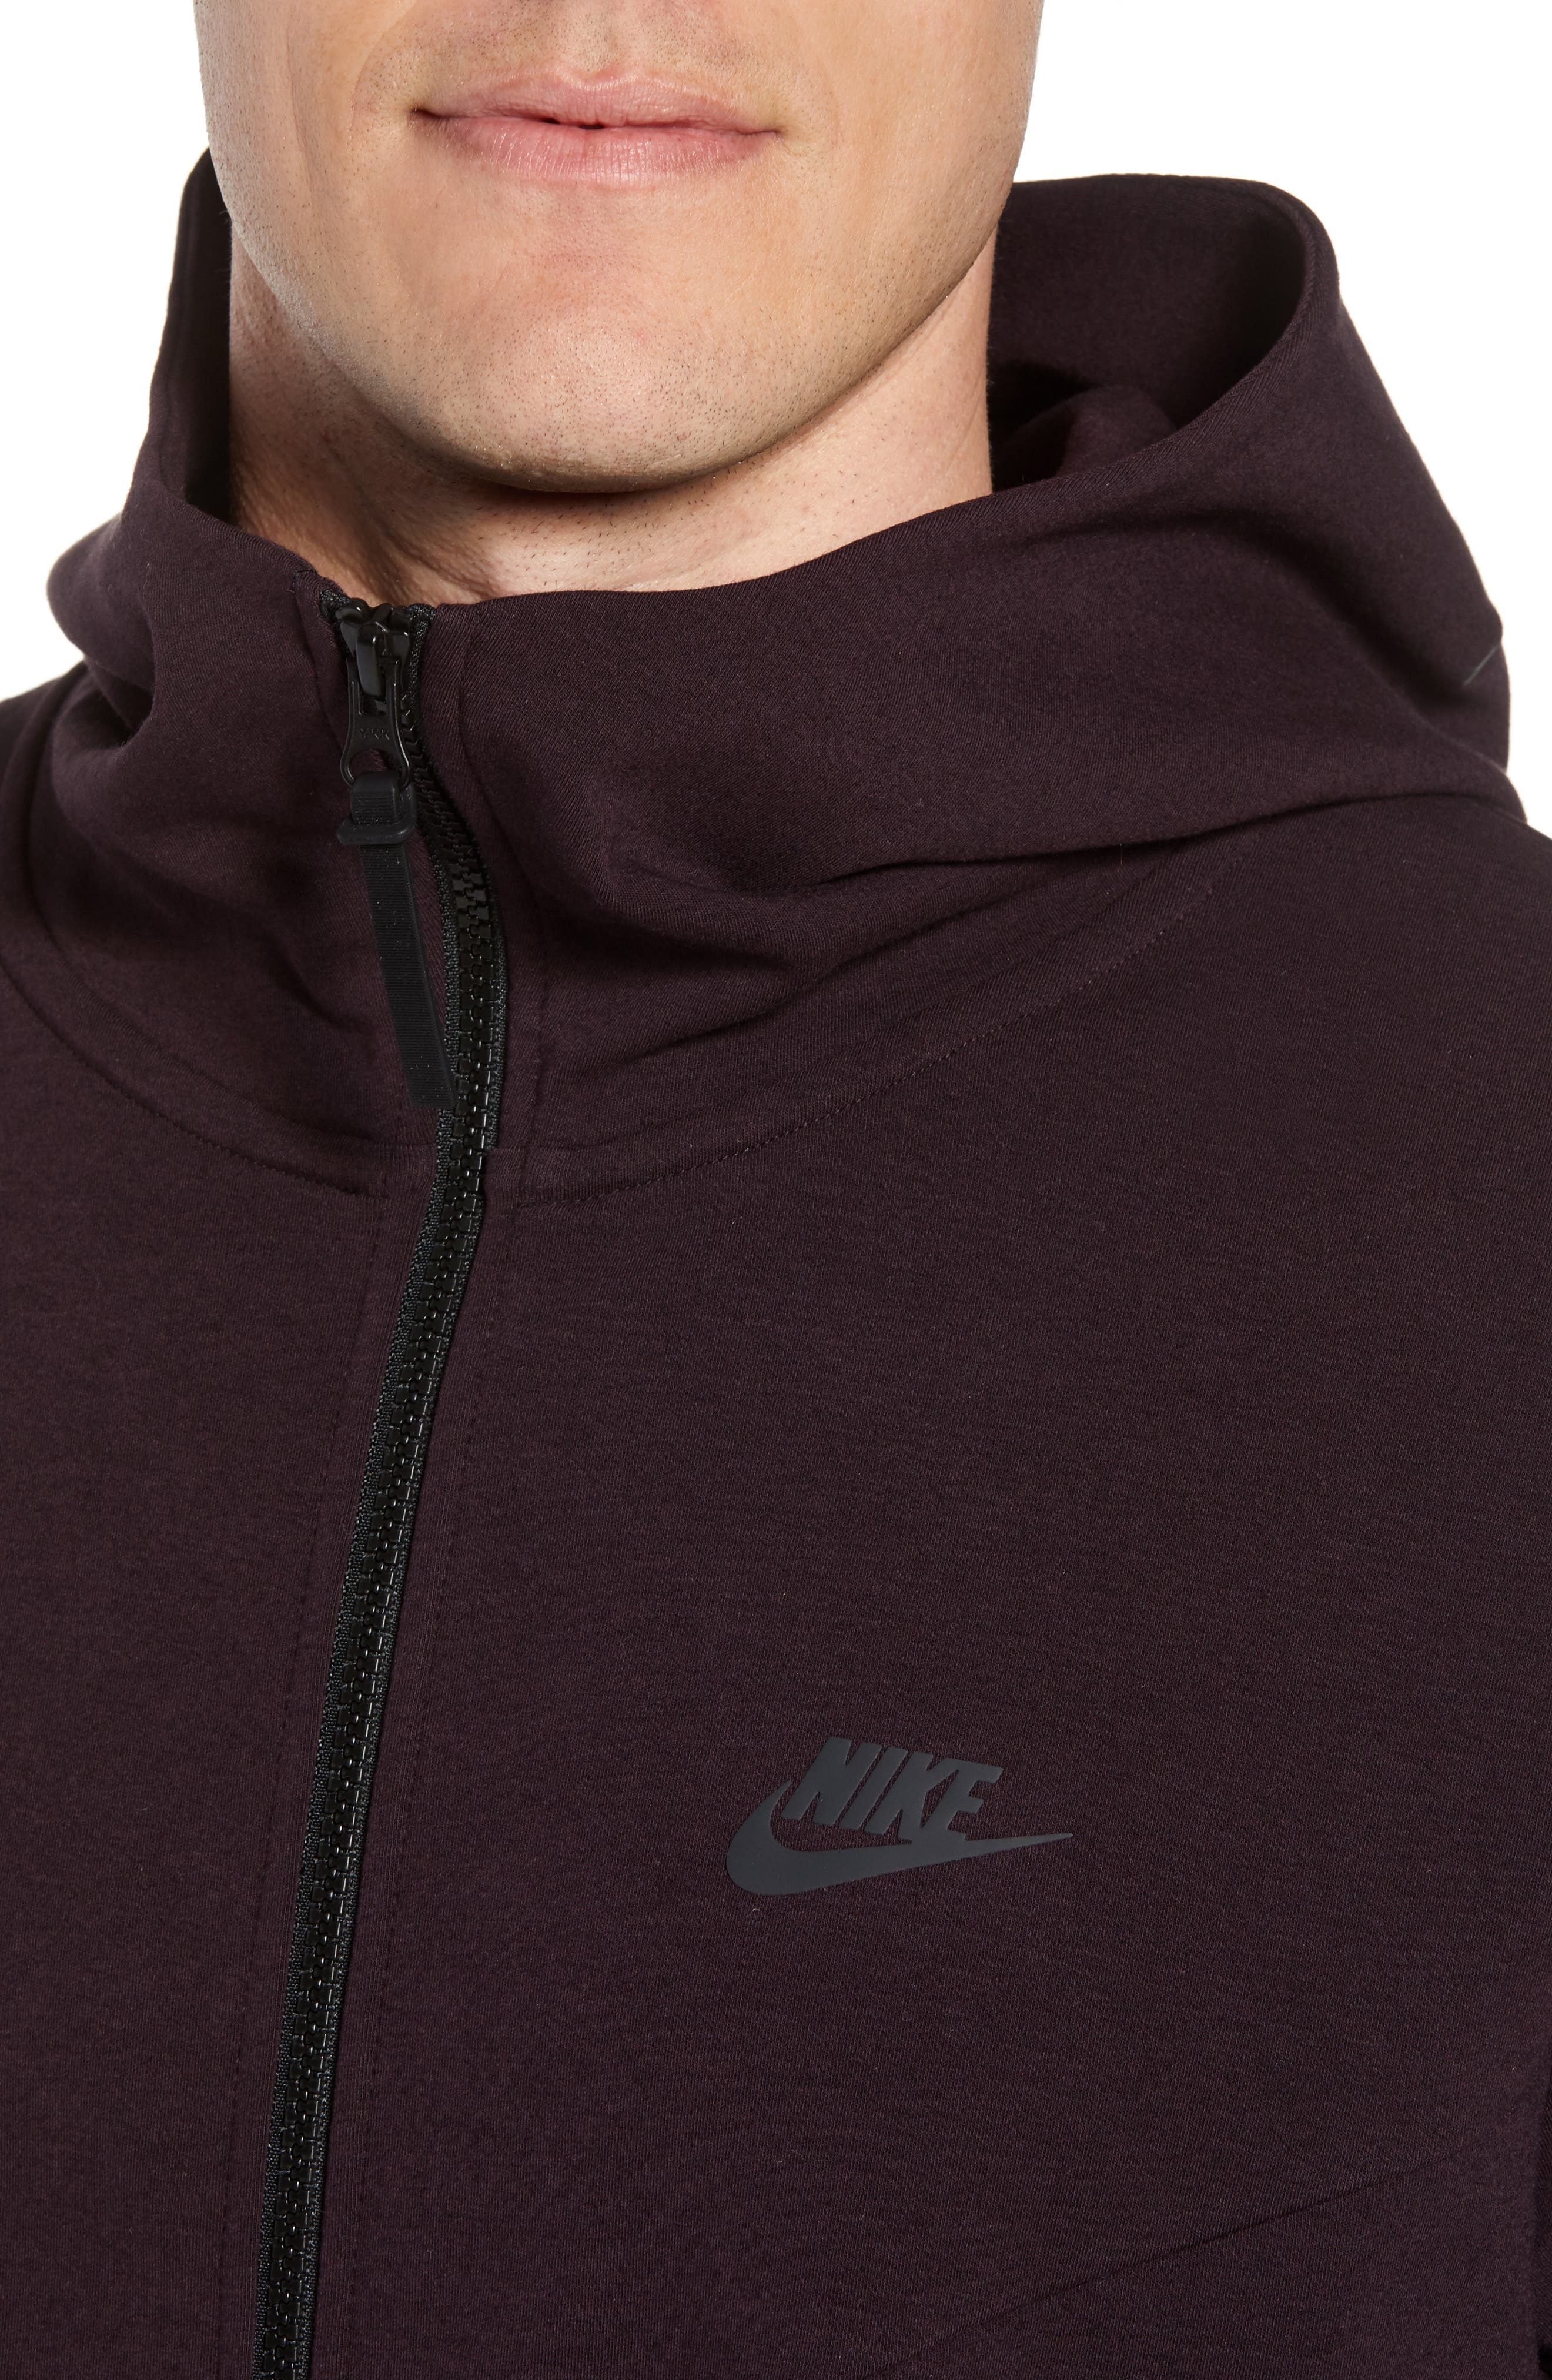 NIKE,                             Sportswear Tech Full Zip Hoodie,                             Alternate thumbnail 4, color,                             010